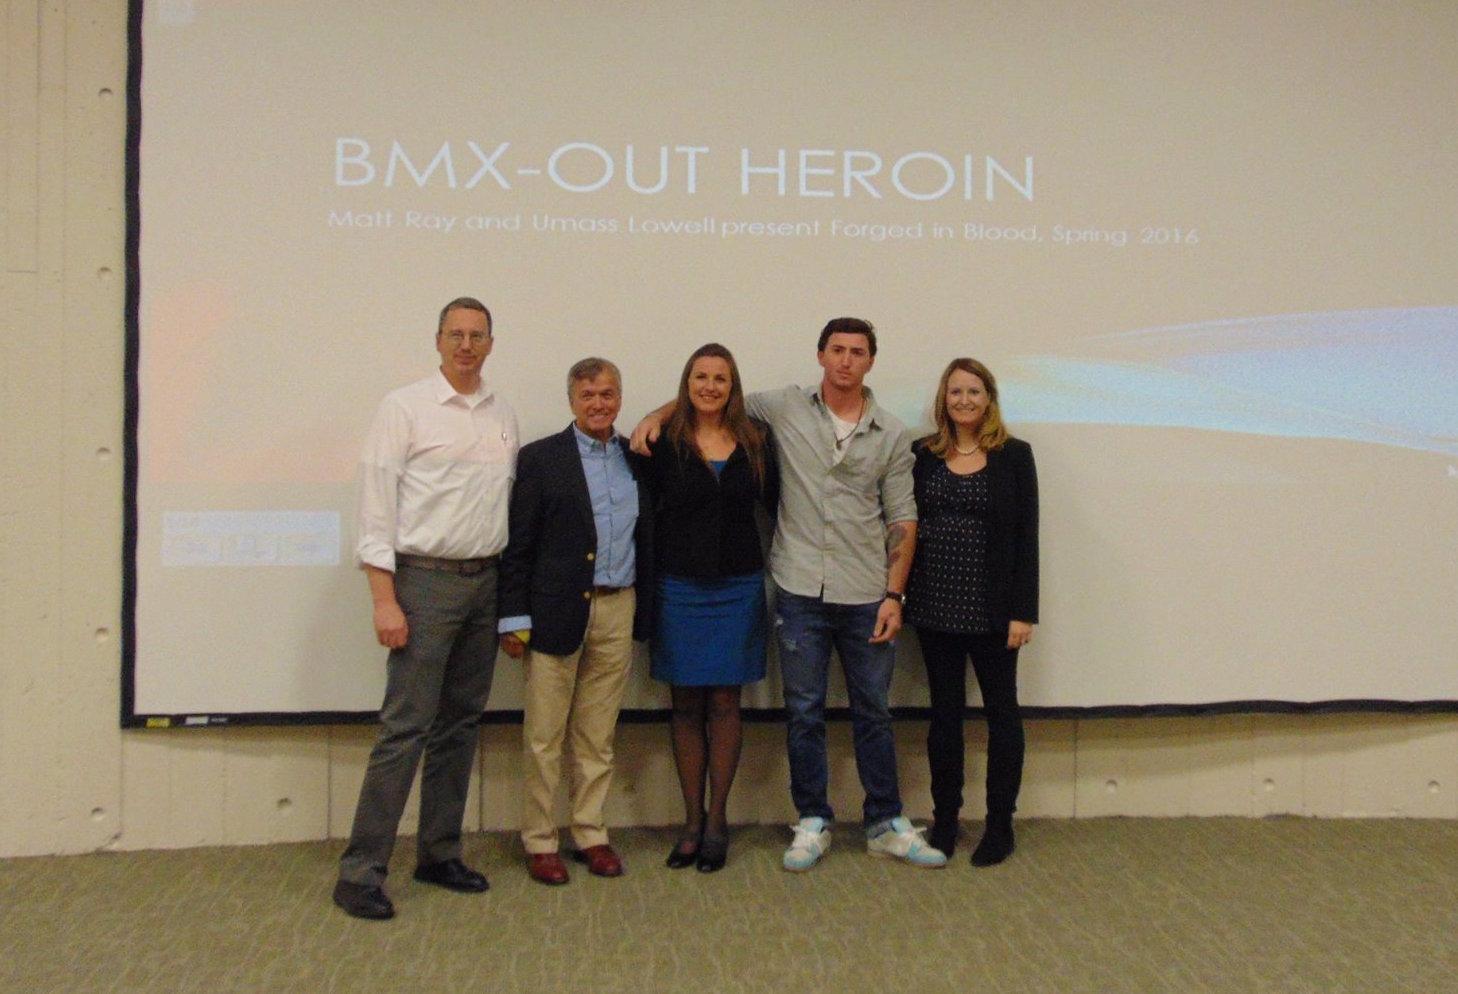 BMX Our Heroin